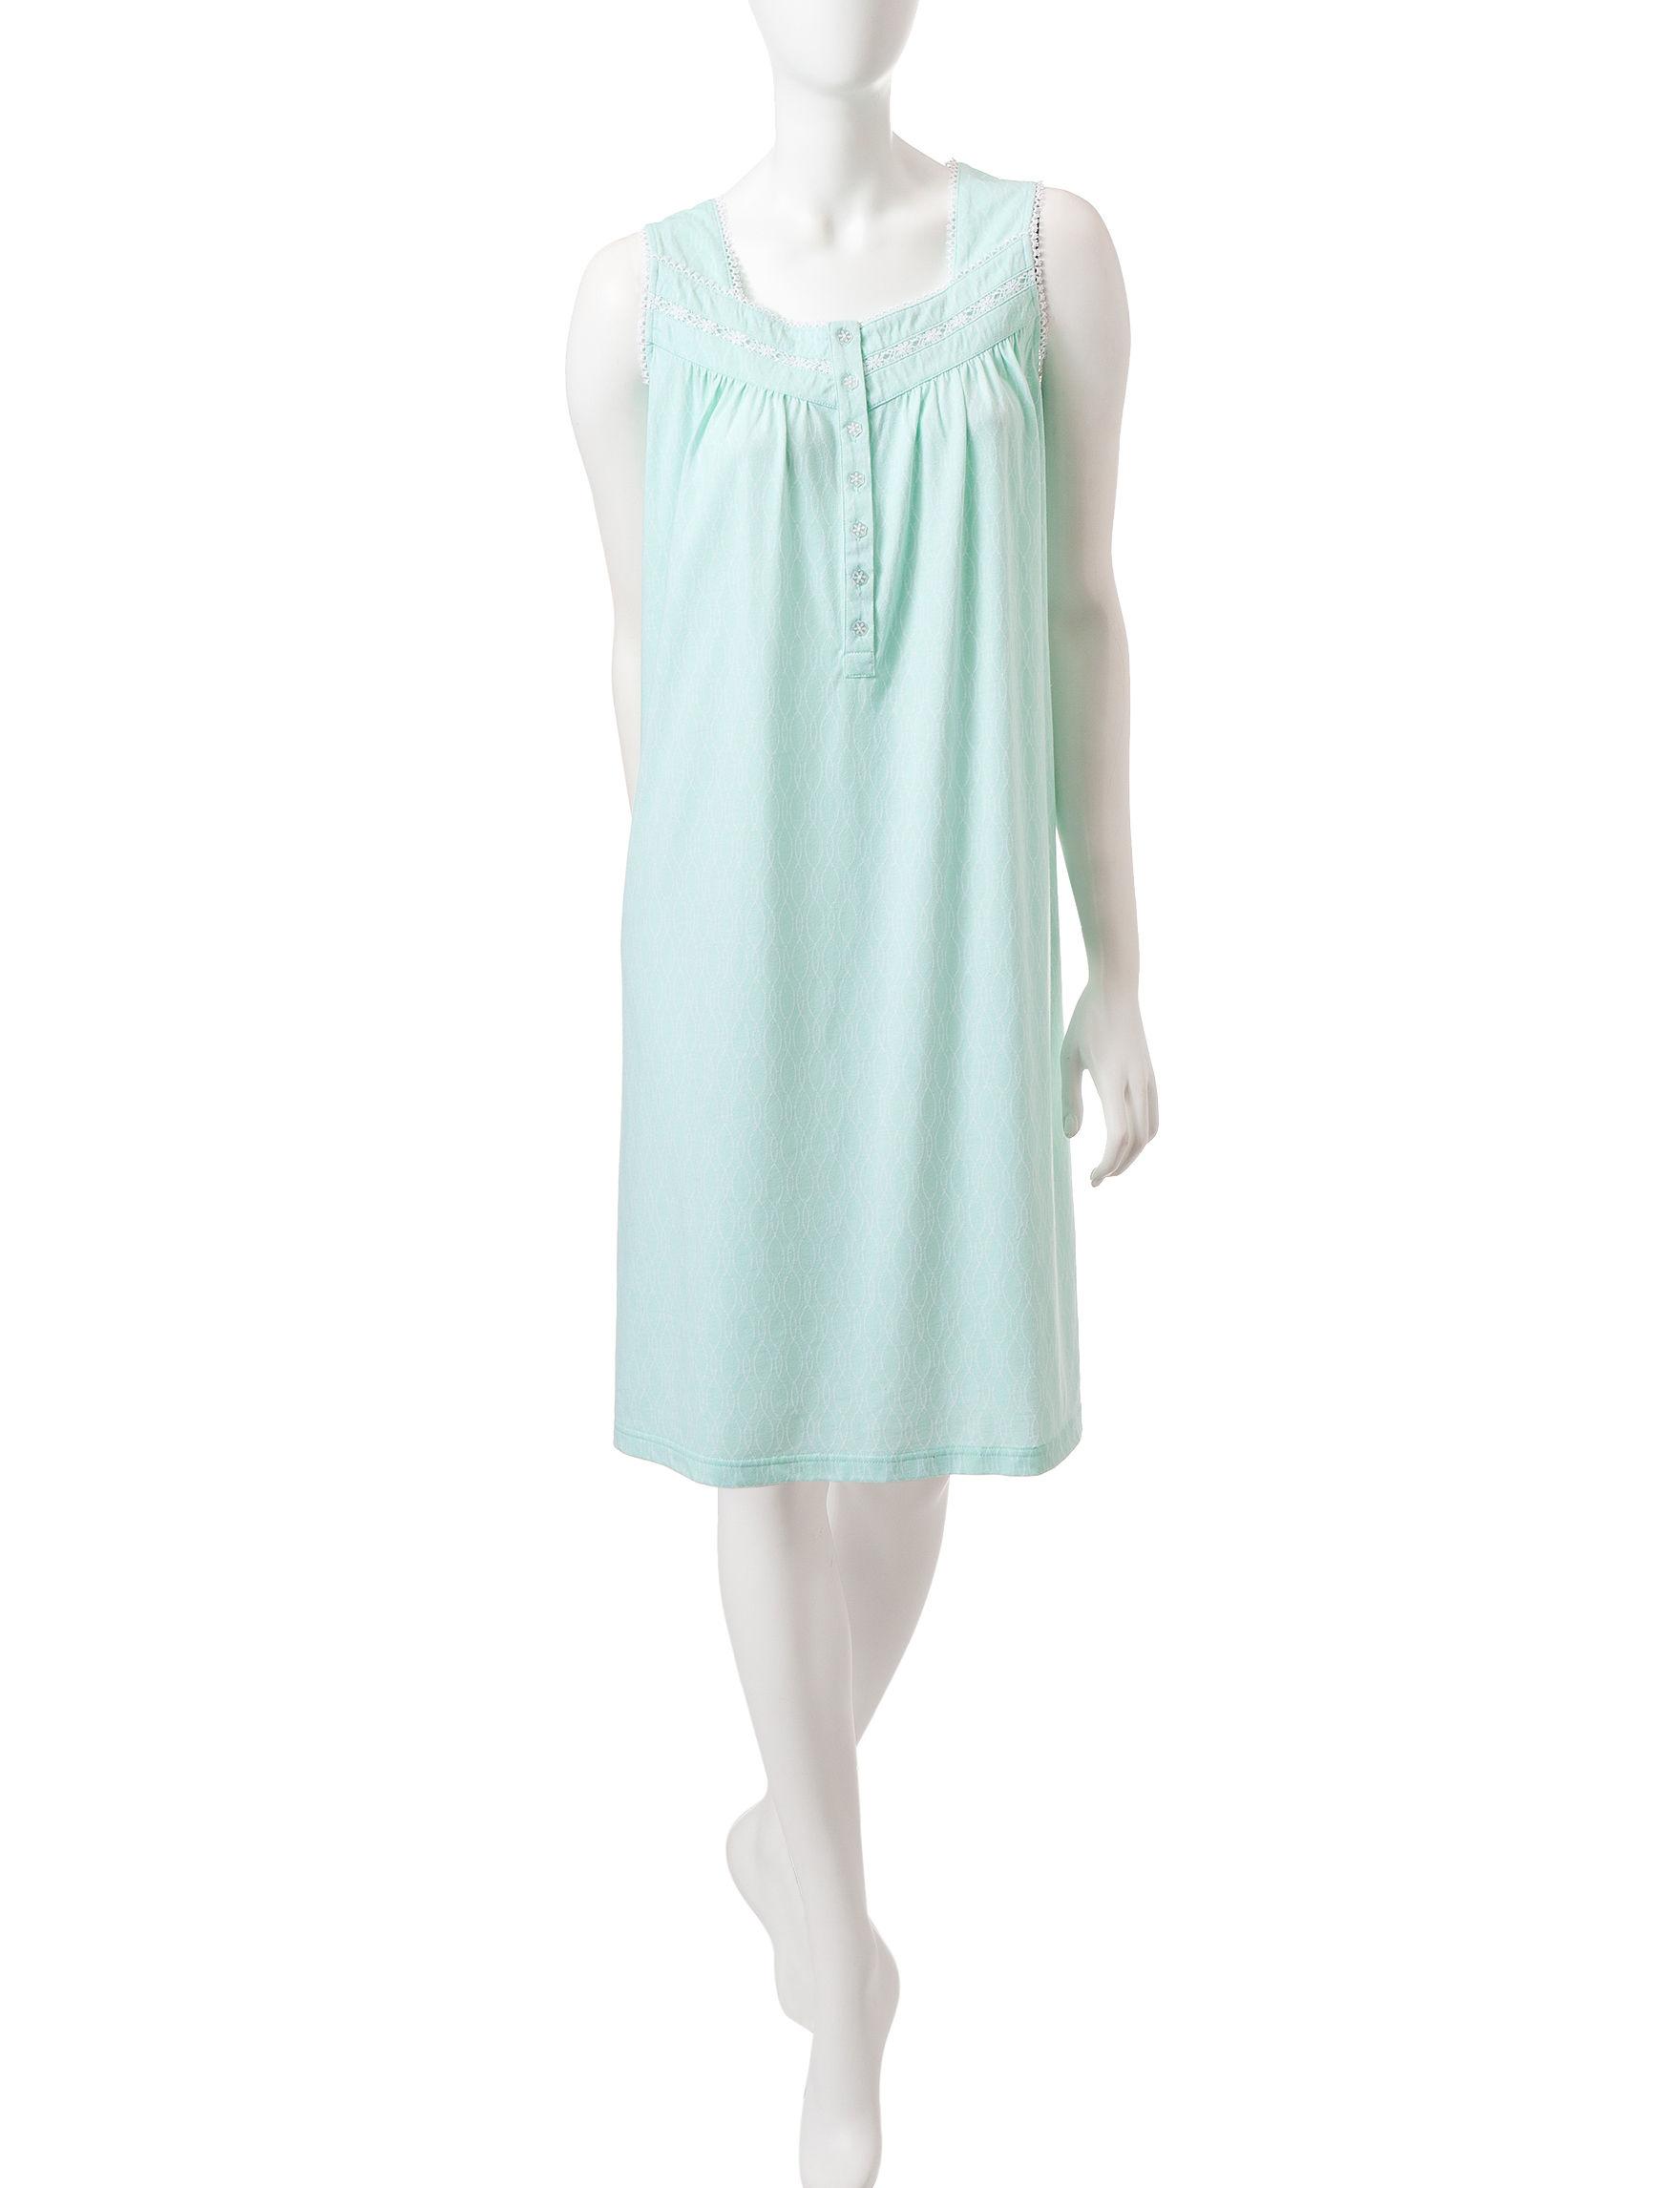 Jasmine Rose Mint Nightgowns & Sleep Shirts